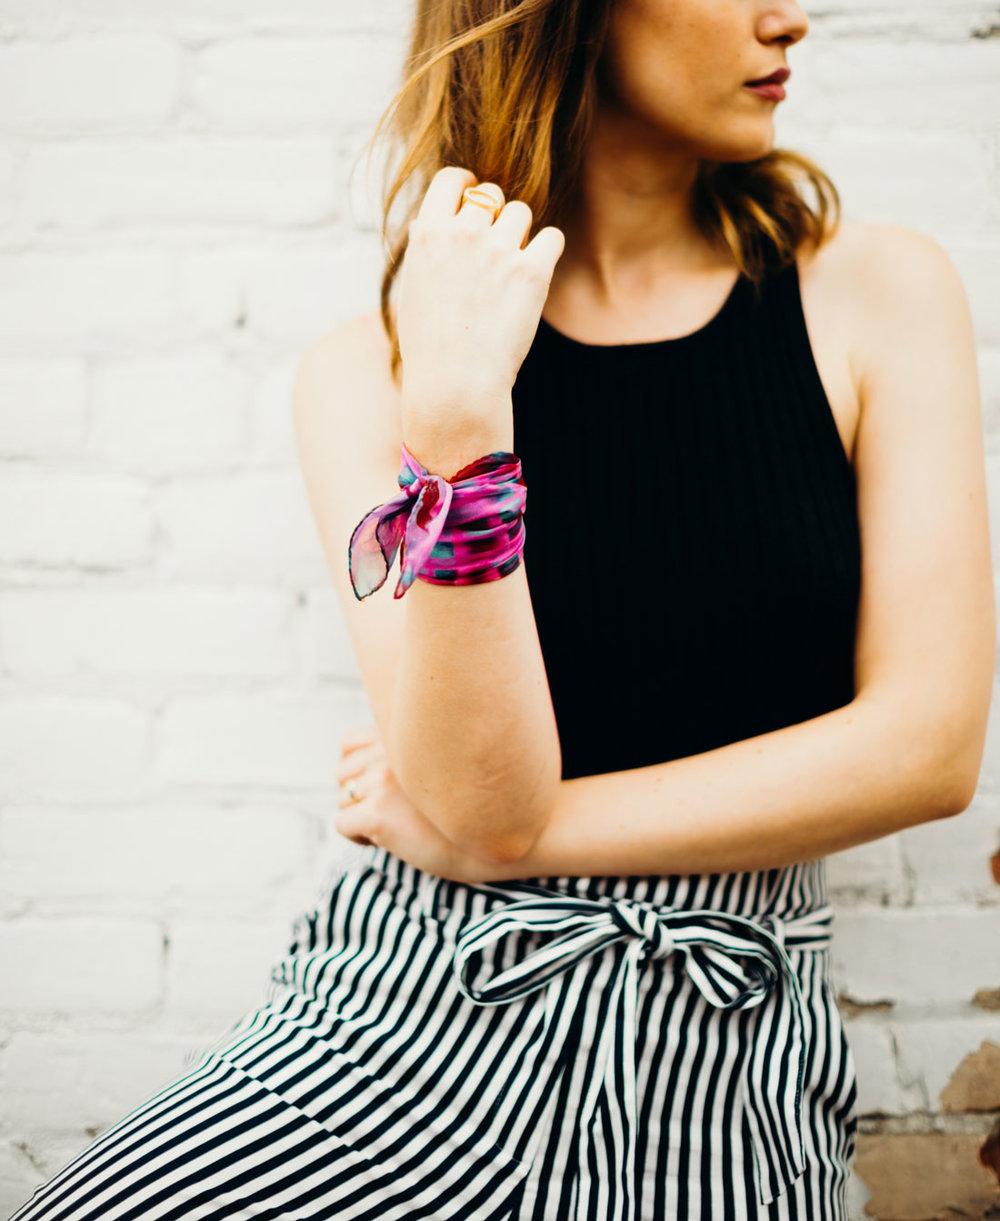 buy fluo pink scarf wristband online paris taipei tokyo. スカーフコーデ for selfridges isetan hypebeast.